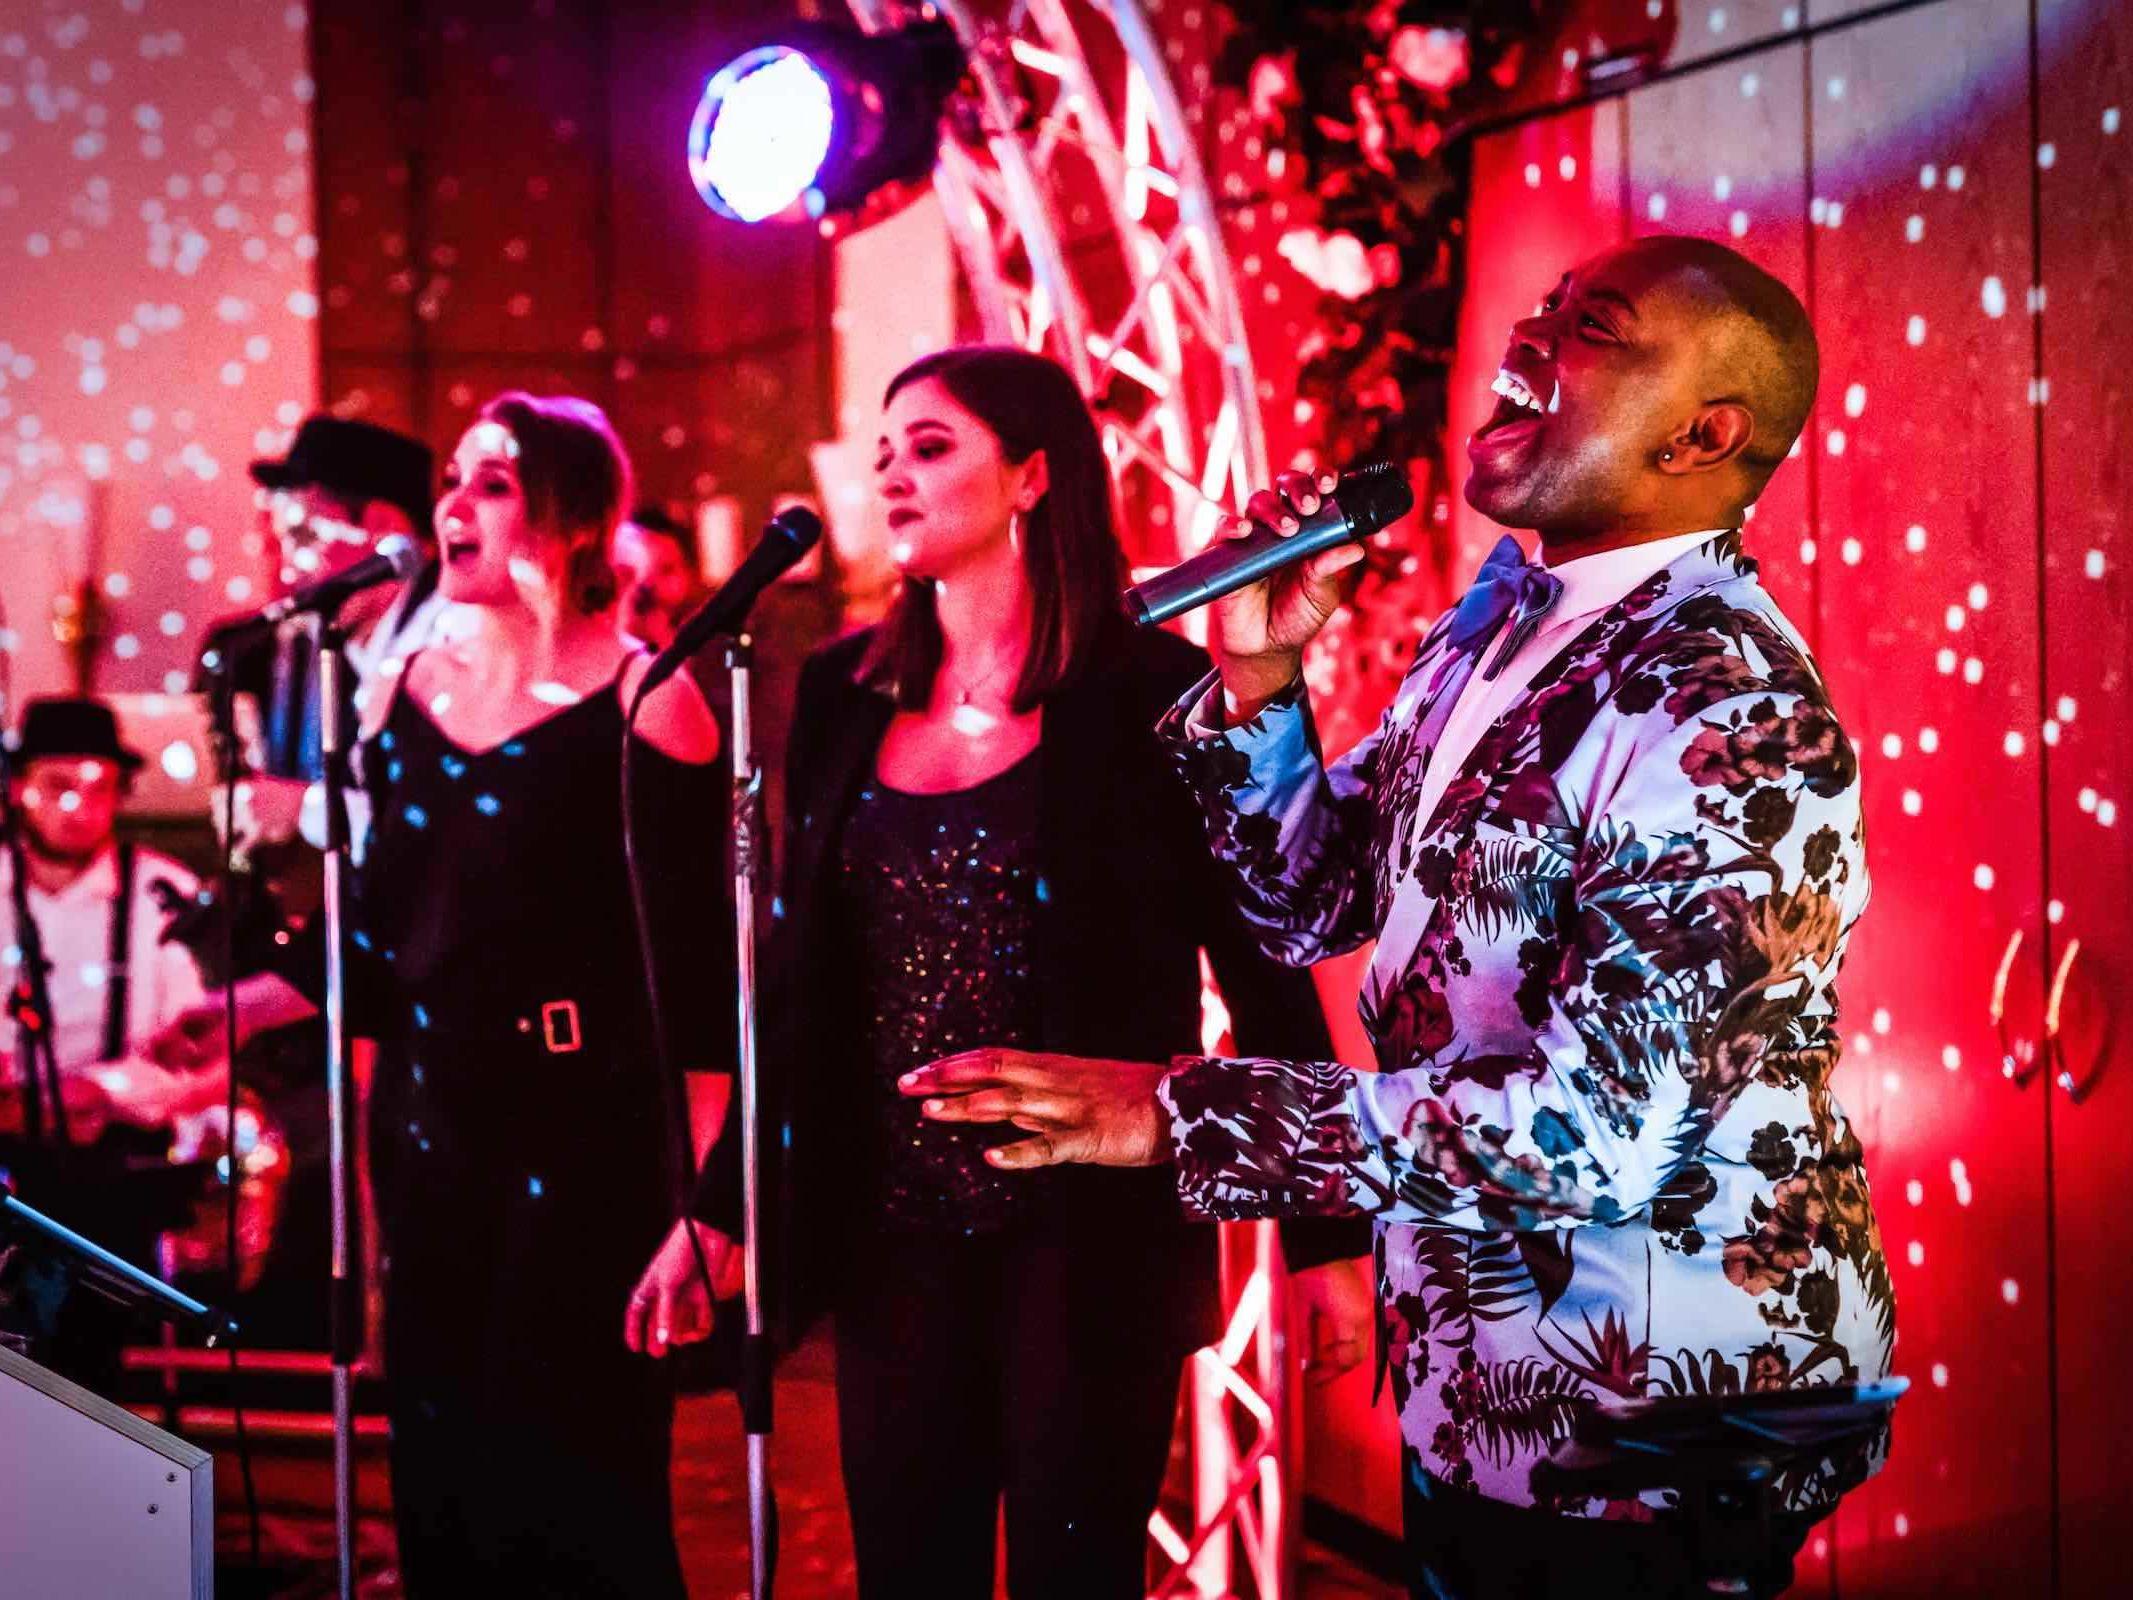 Partyband | Hochzeit | Hannover | Buchen | Liveband | Livemusik | Pop | Swing | Jazz | Band | Sänger | Empfang | Standesamt | Messe | Firmenfeier | Buchen | Mieten | Anfragen | Lehmann | Eventservice